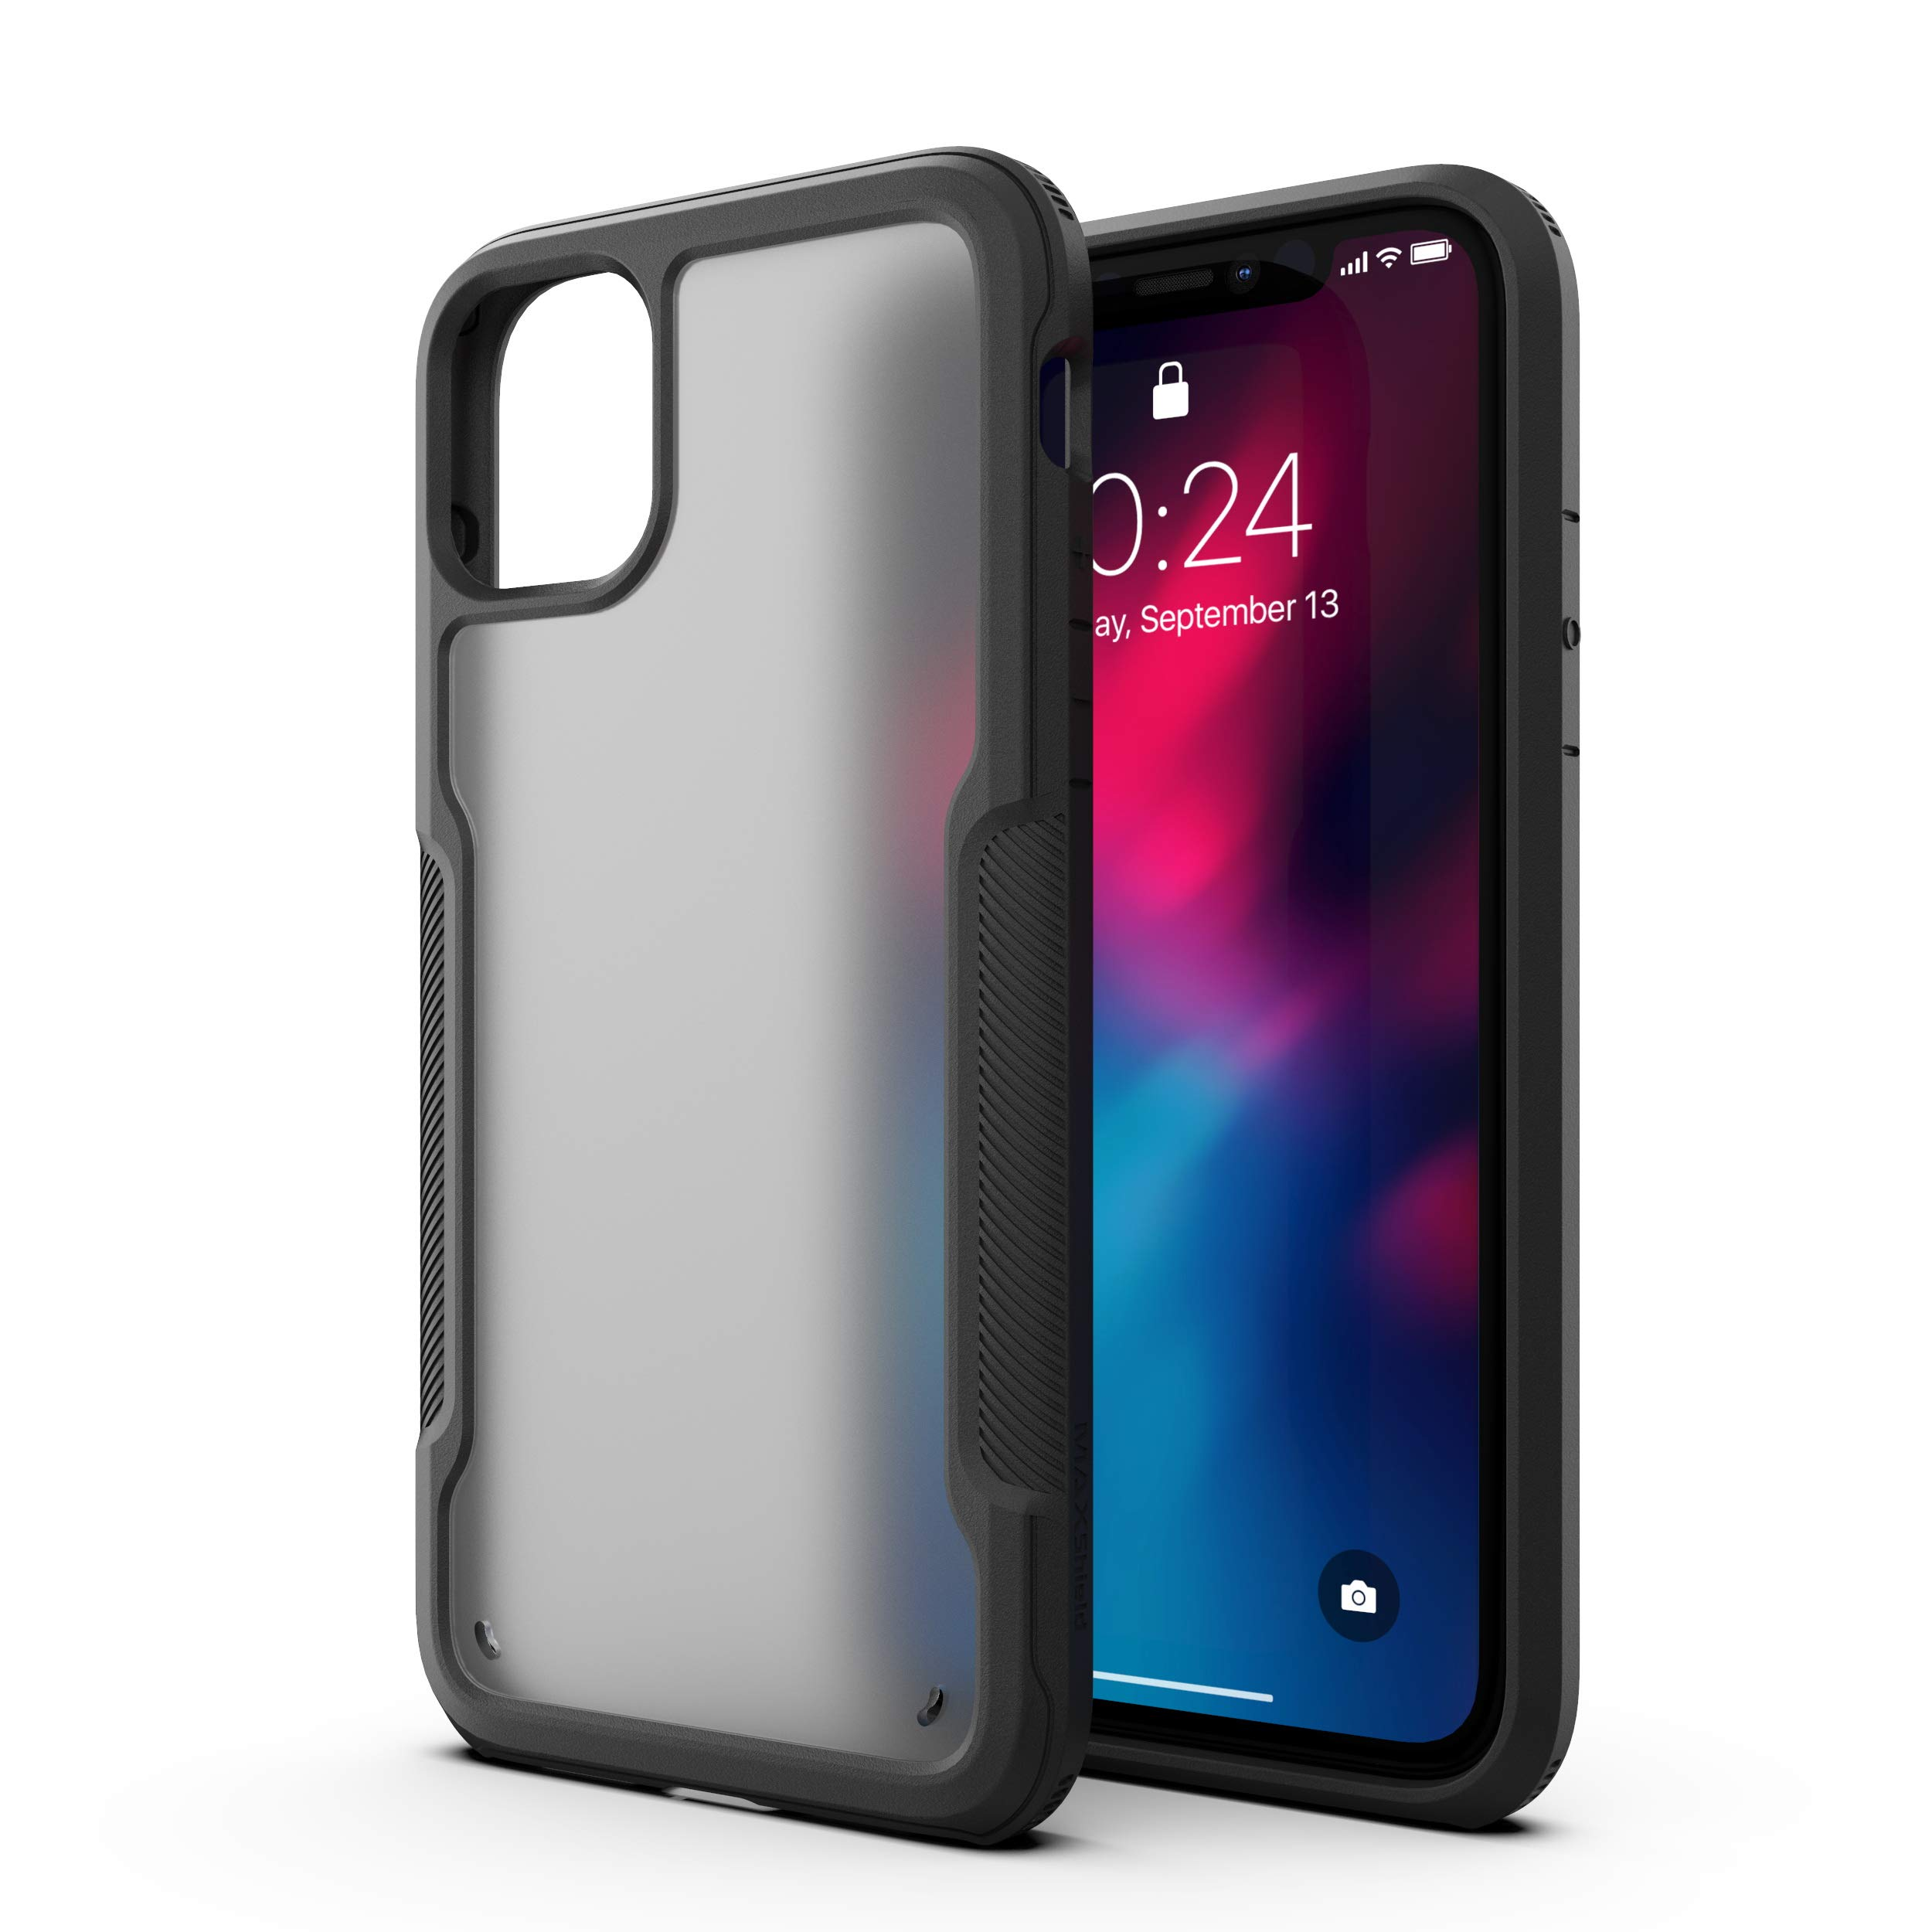 MAXSHIELD Compatible with iPhone 11 Pro Max Case, Premium Hybrid Shockproof Protective Slim Clear Case [Razor X Series]-Black Matte